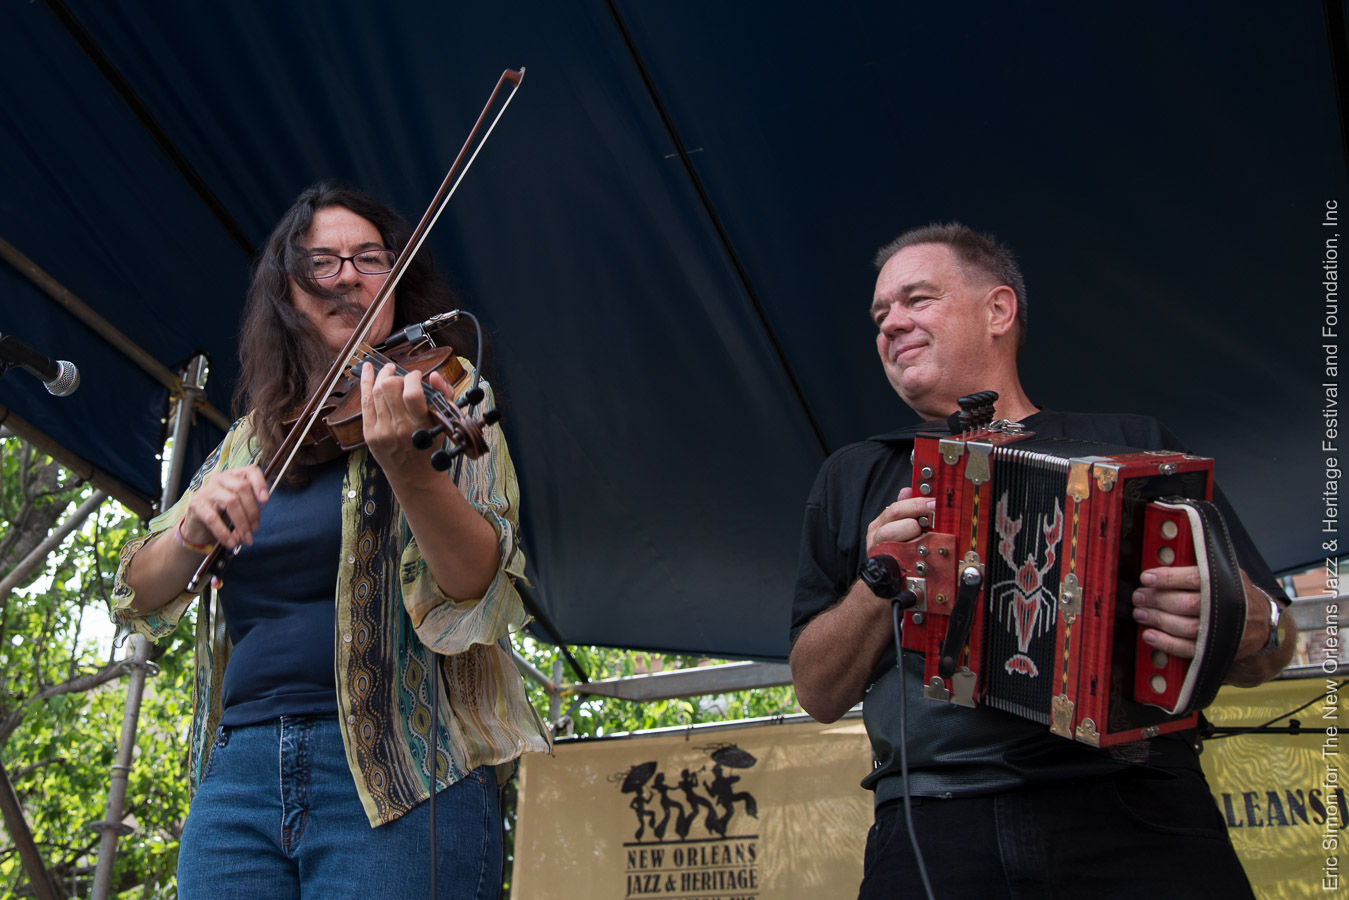 2013 Louisiana Cajun Zydeco Festival, Bruce Daigrepont and Gina Forsythe, Music, New Orleans